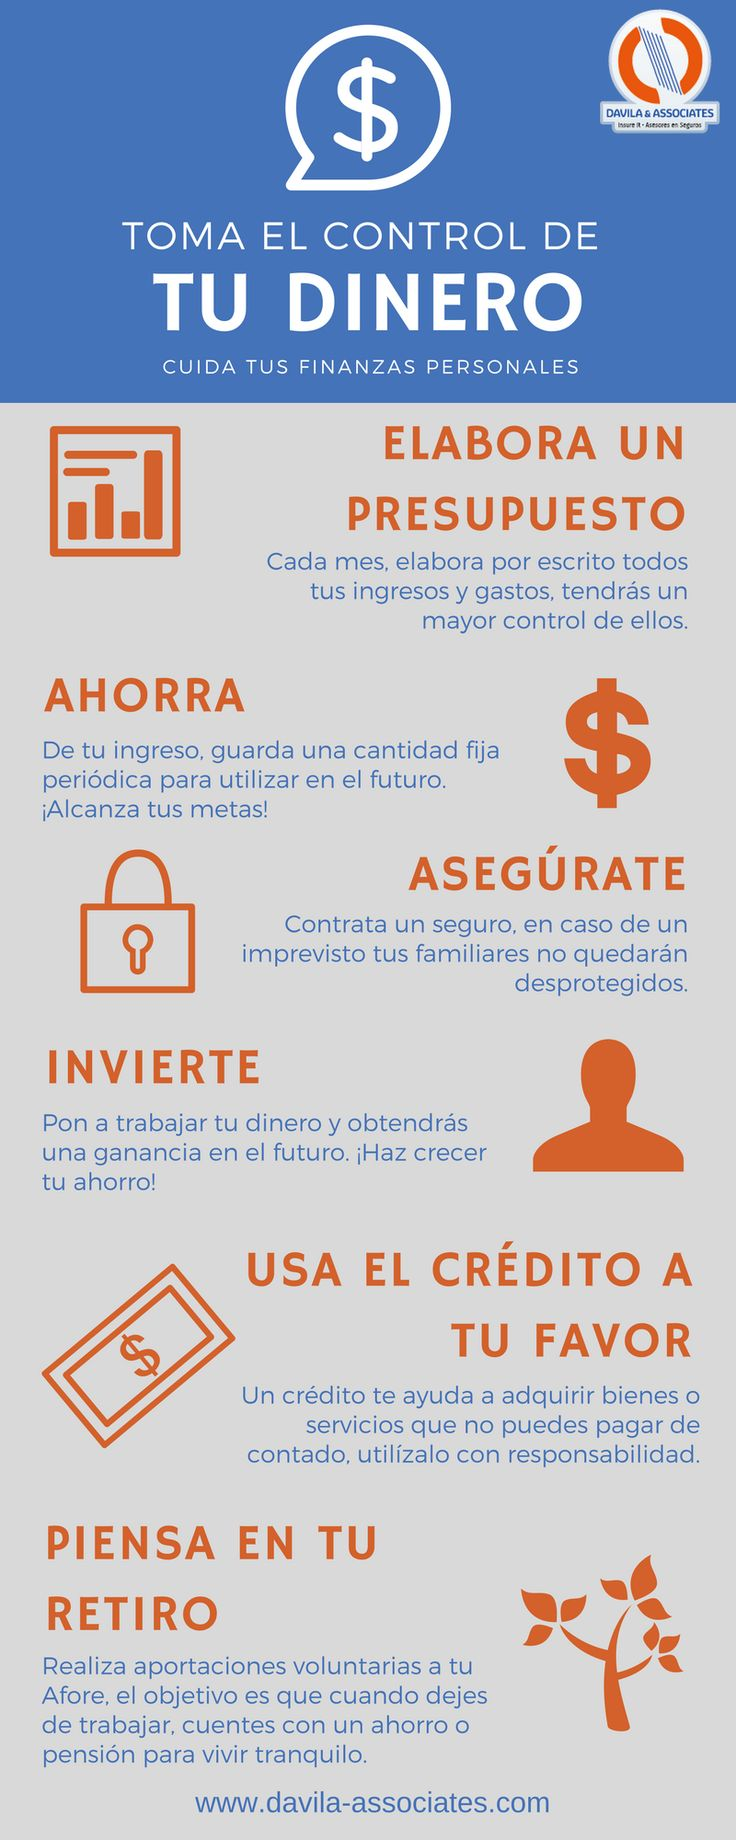 ¿Cómo cuidas tus finanzas personales? #seguro #vida #retiro #ahorro #dinero #segurodevida #segurosdavila #contigo #asesoresdeseguros #mexico